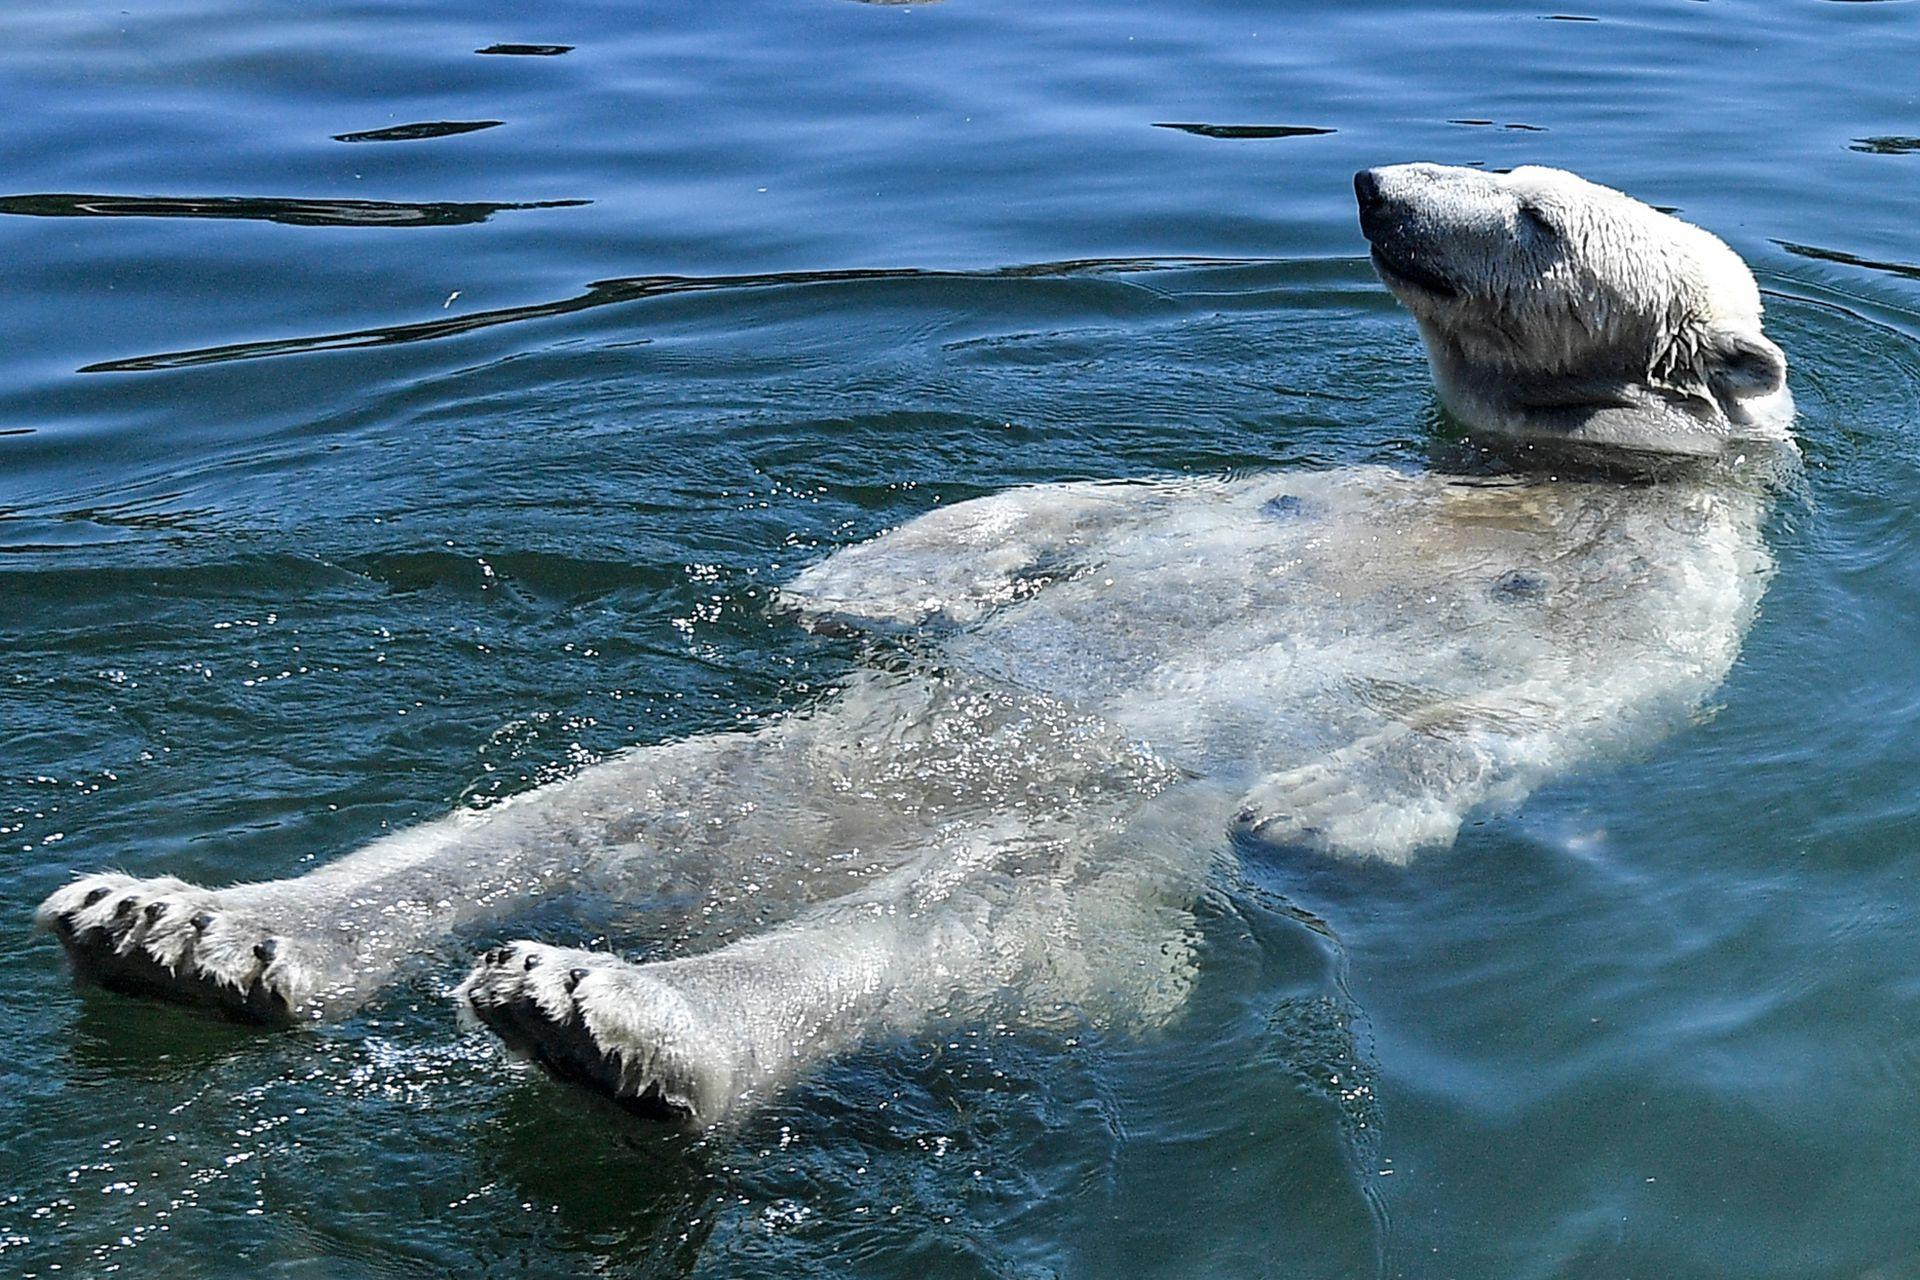 El oso polar Nanook toma un baño durante un caluroso verano en el zoológico de Gelsenkirchen, Alemania